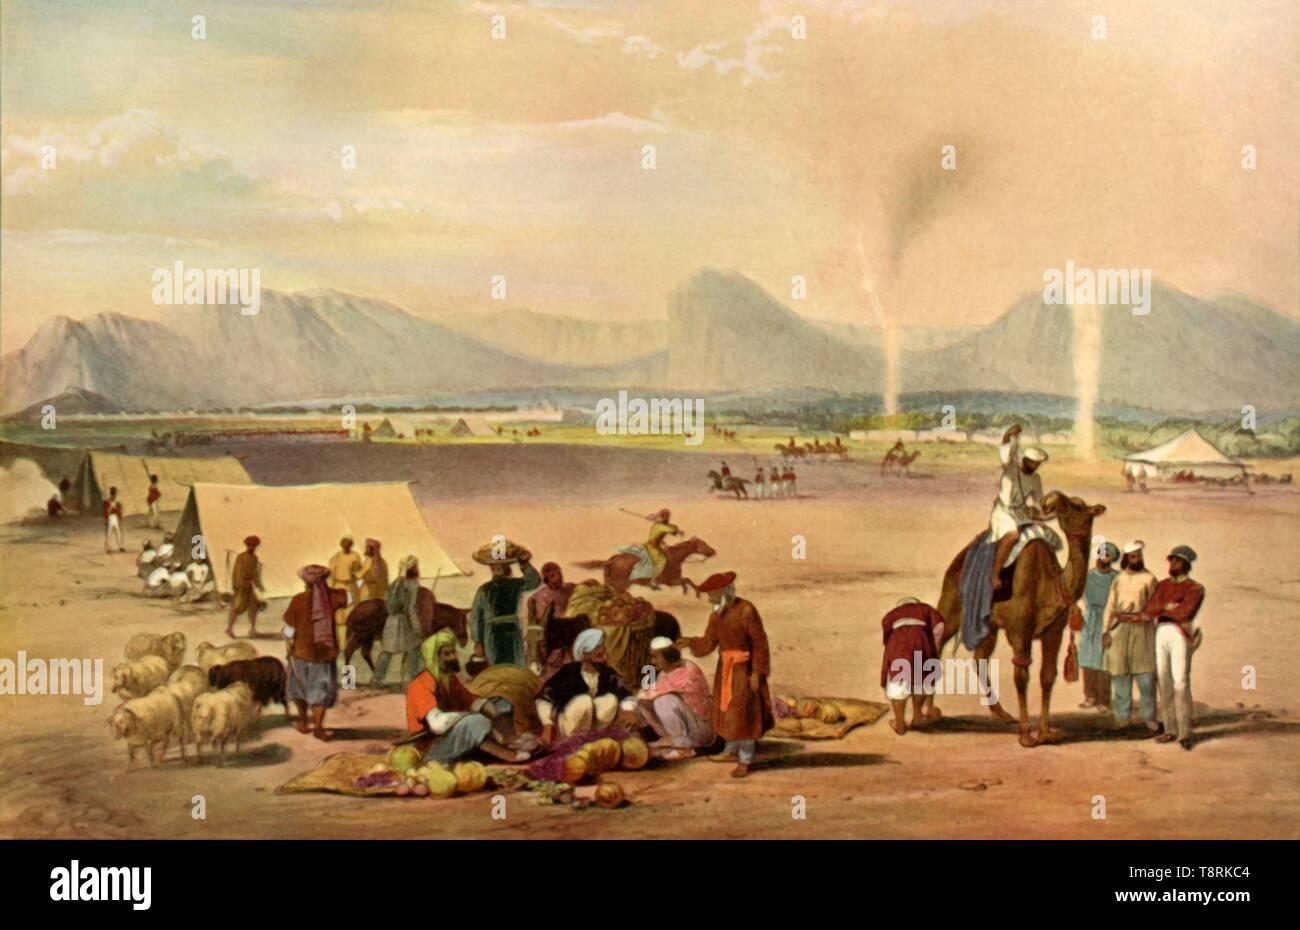 'The City of Kandahar Looking from the South Towards Baba Wali Mountain', c1840, (1901).  Creator: James Atkinson. - Stock Image